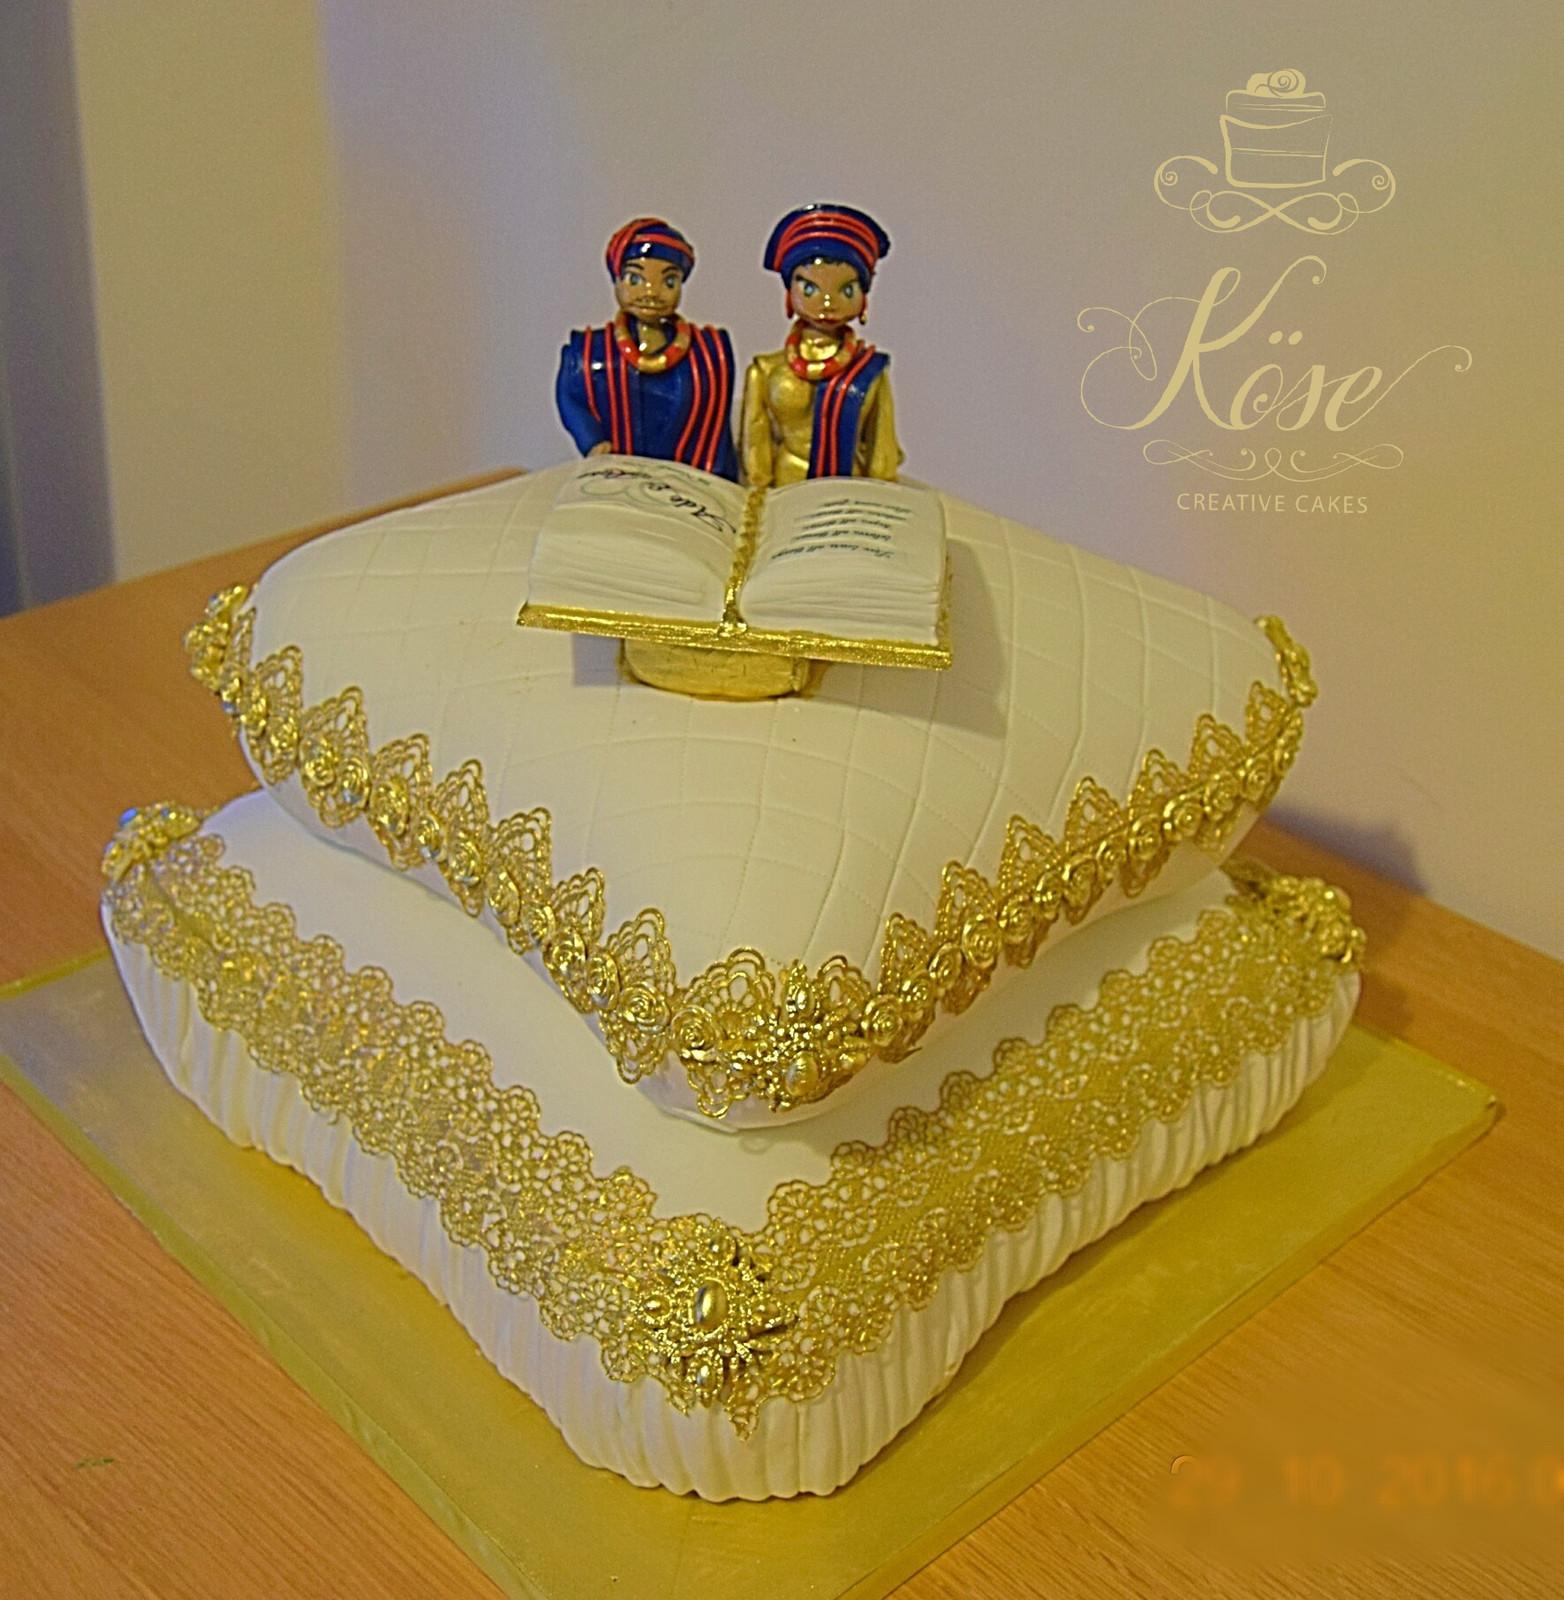 Bespoke Wedding Cakes from Kose Creative Cakes   Order Cakes Online ...